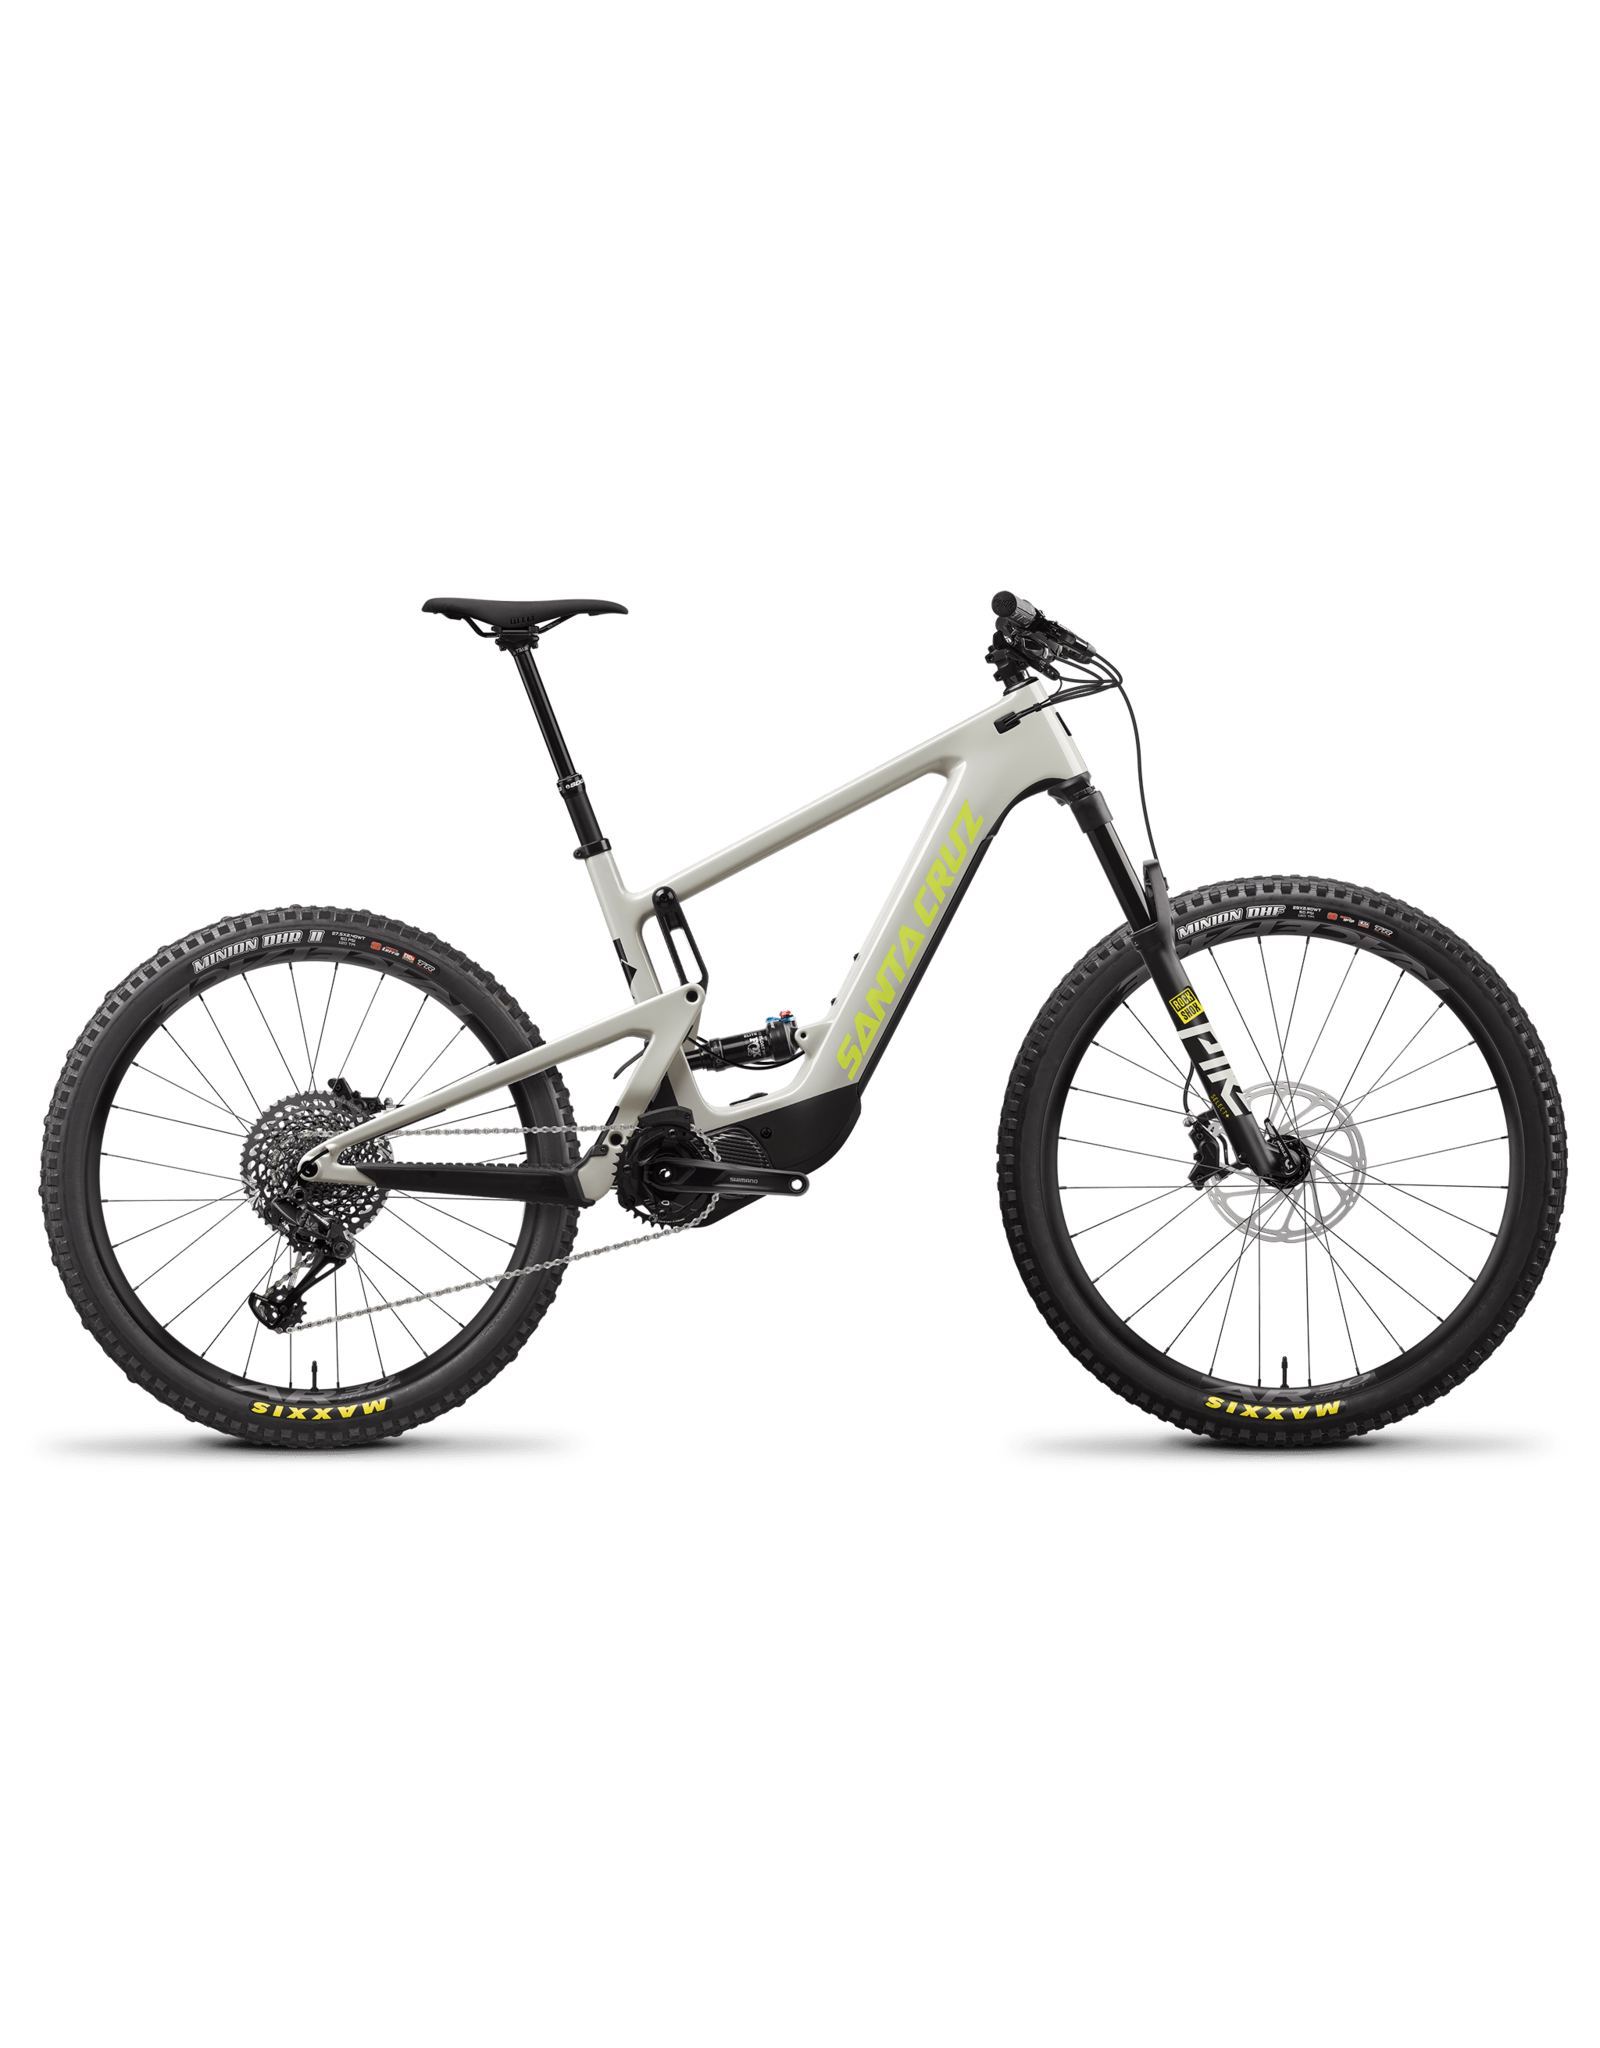 Santa Cruz Bicycles Heckler CC MX S-Kit Size LG, Fog USA